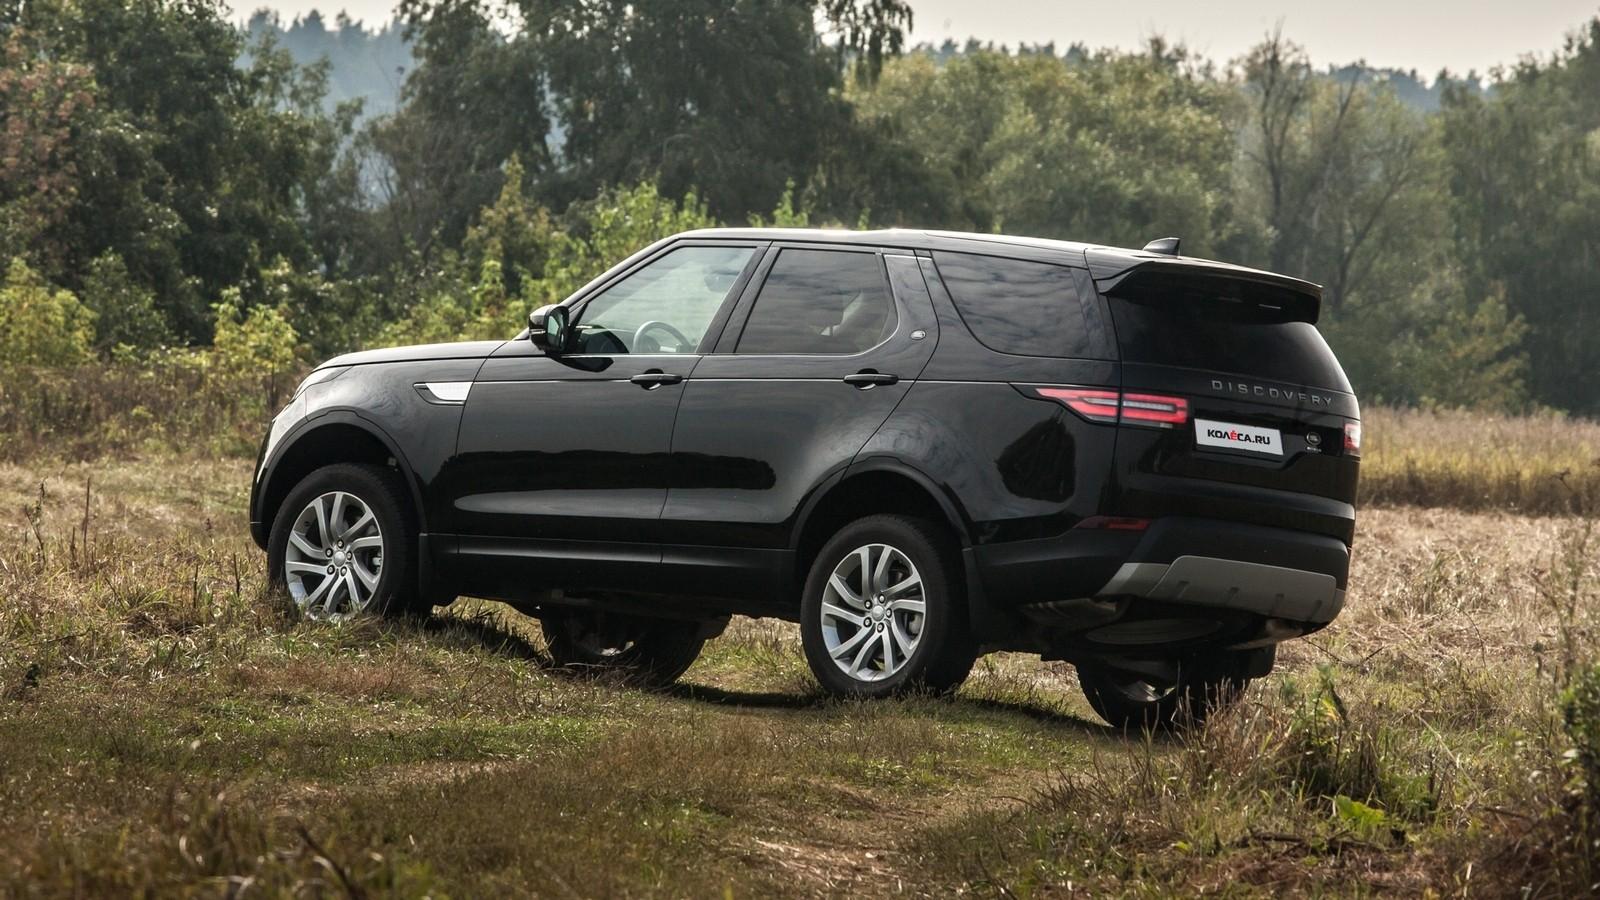 Land Rover Discovery чёрный сзади (2)